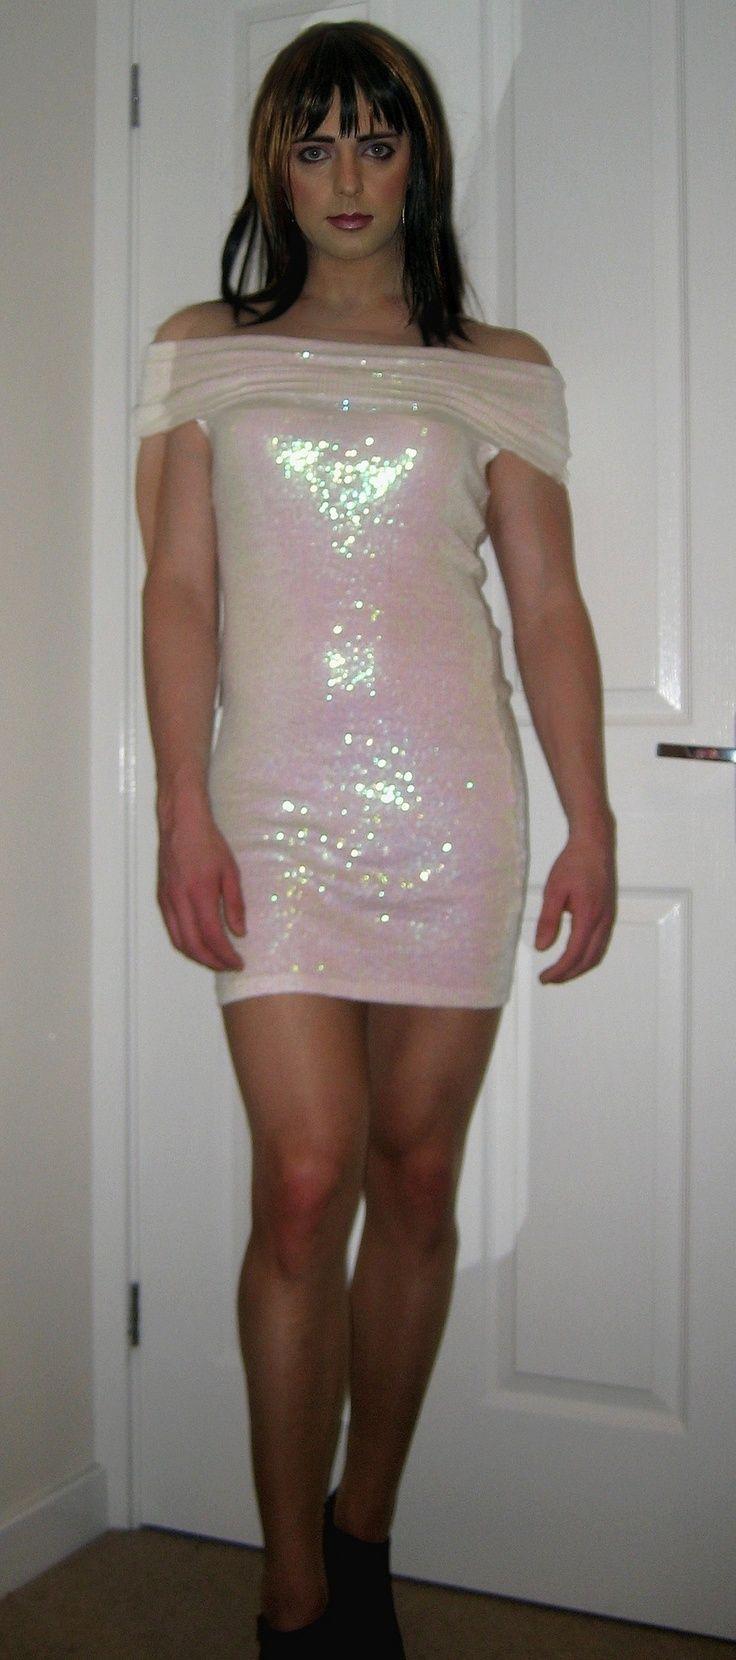 S TGIRL WORLD Source: soniafloralie-world   Transgender   Pinterest   Amazing photos,  Boys and Toms